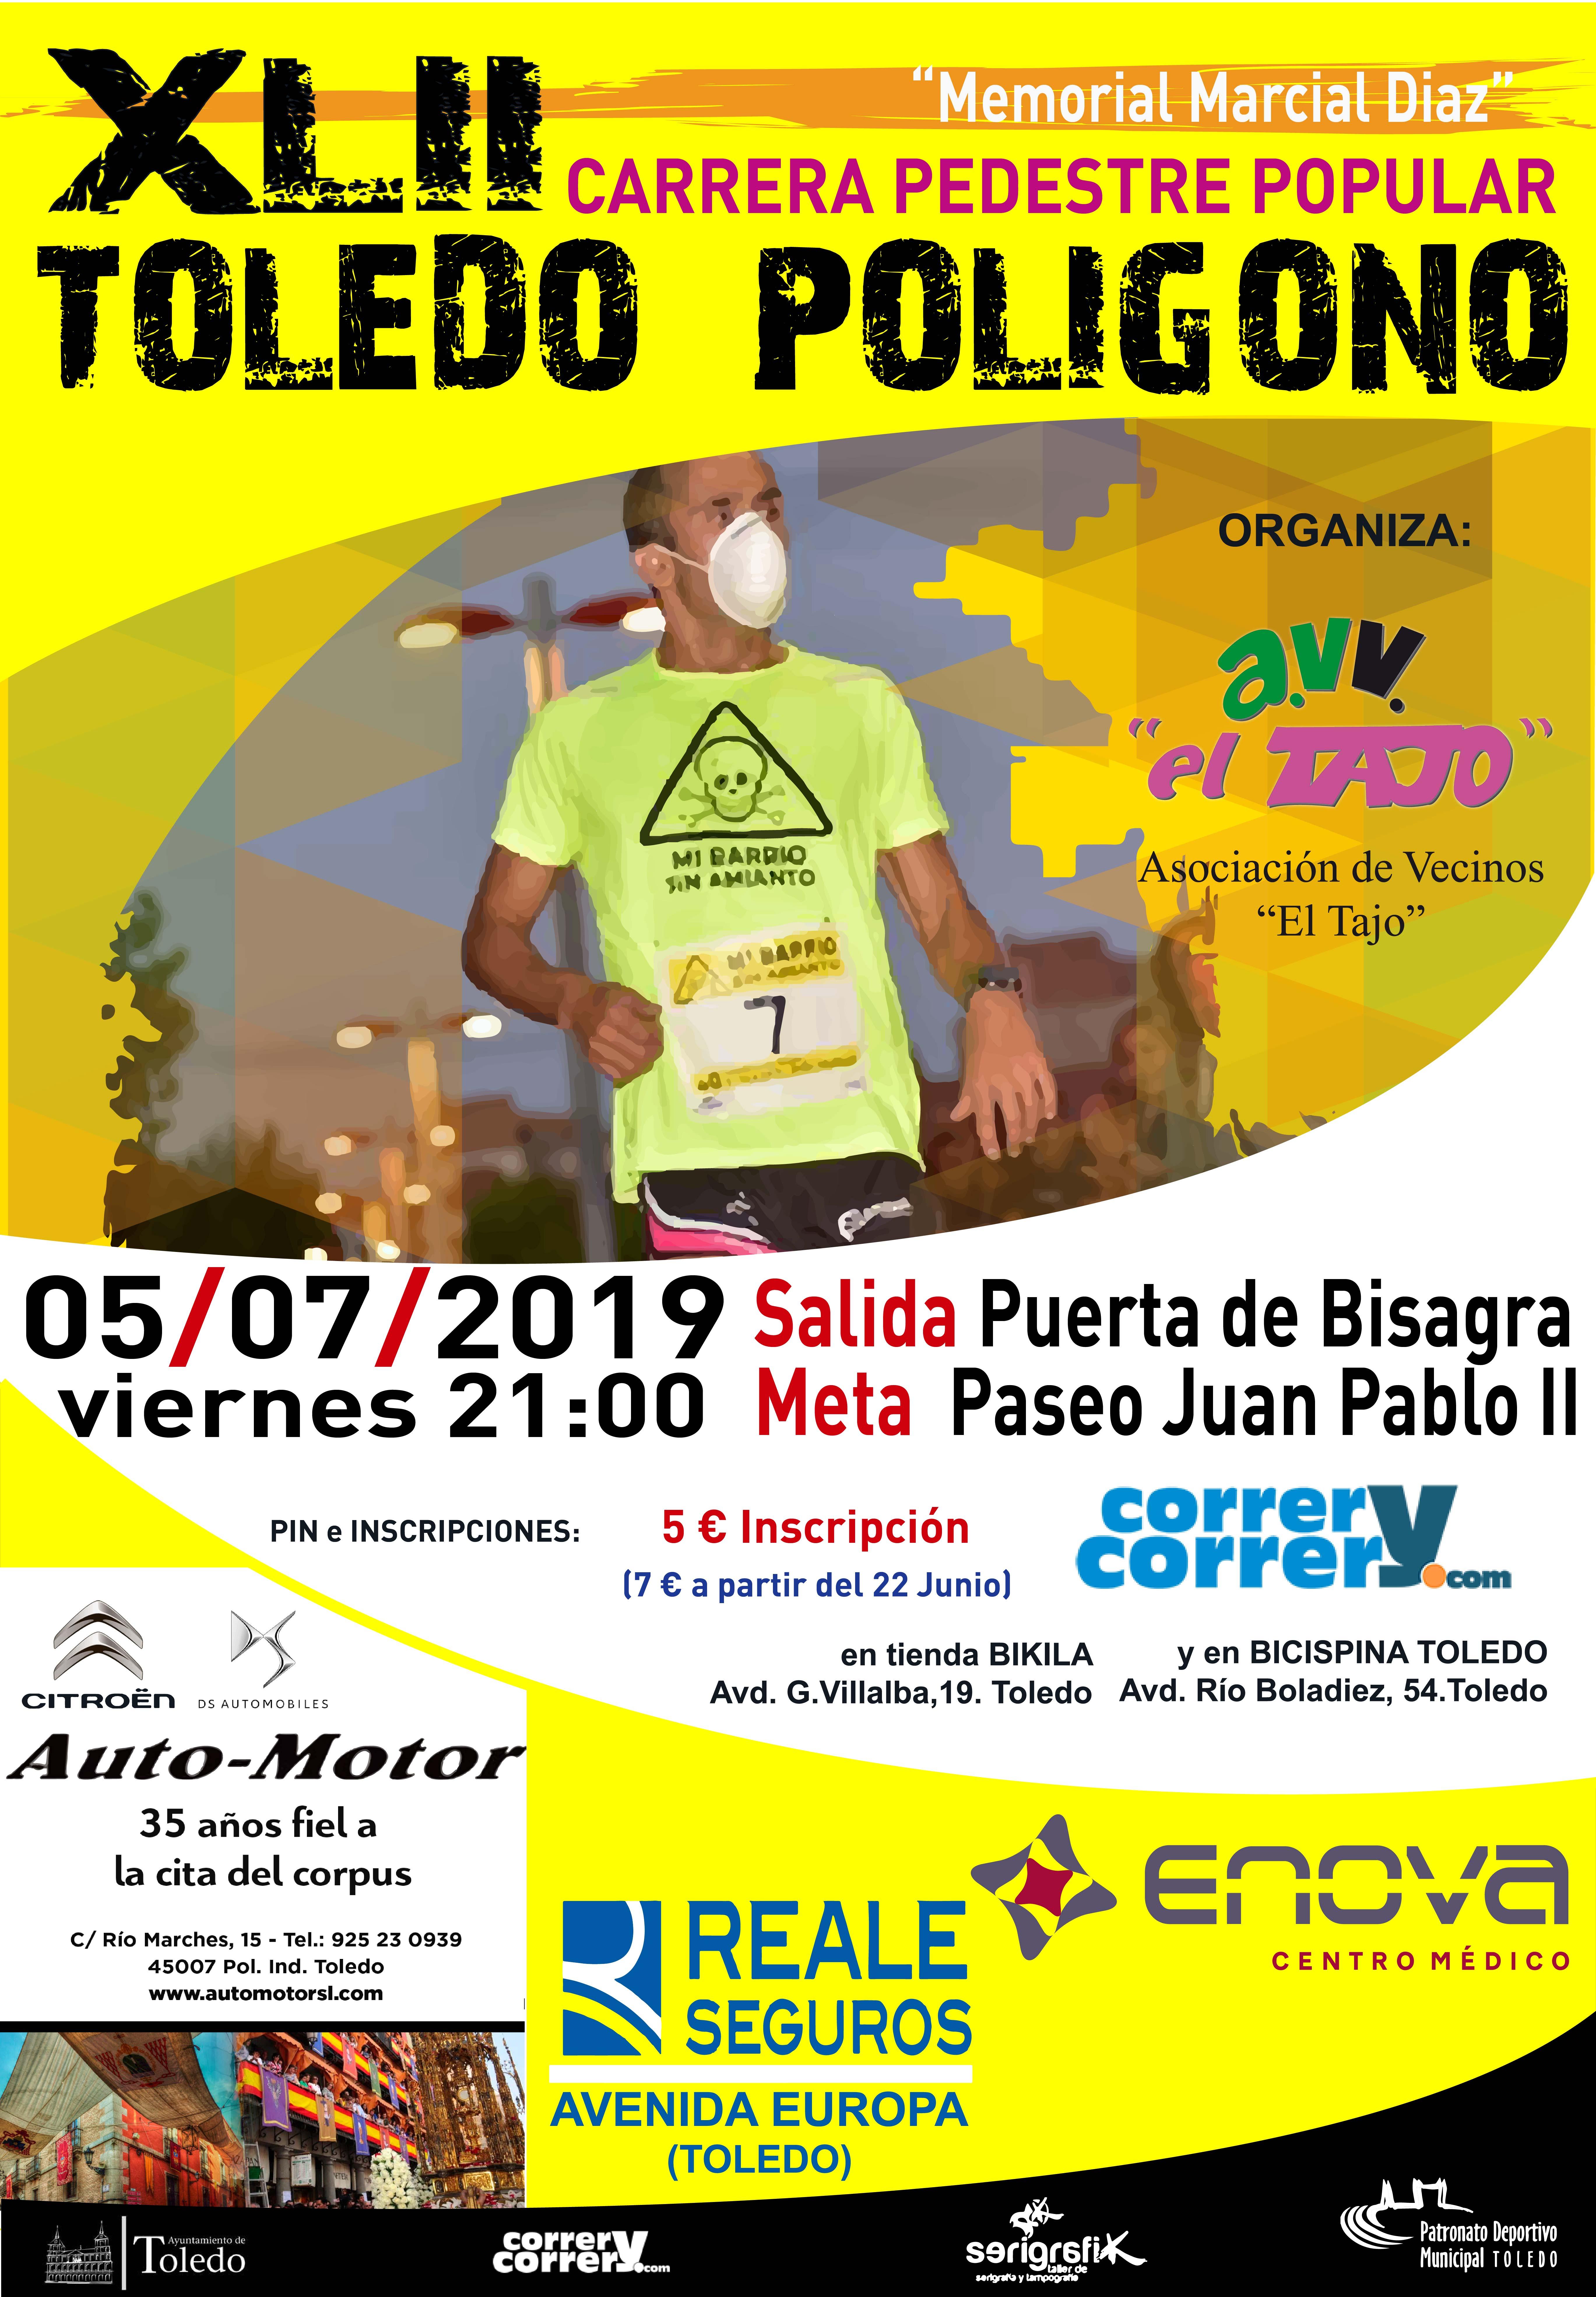 XLII Carrera Pedestre Popular Toledo-Poligono